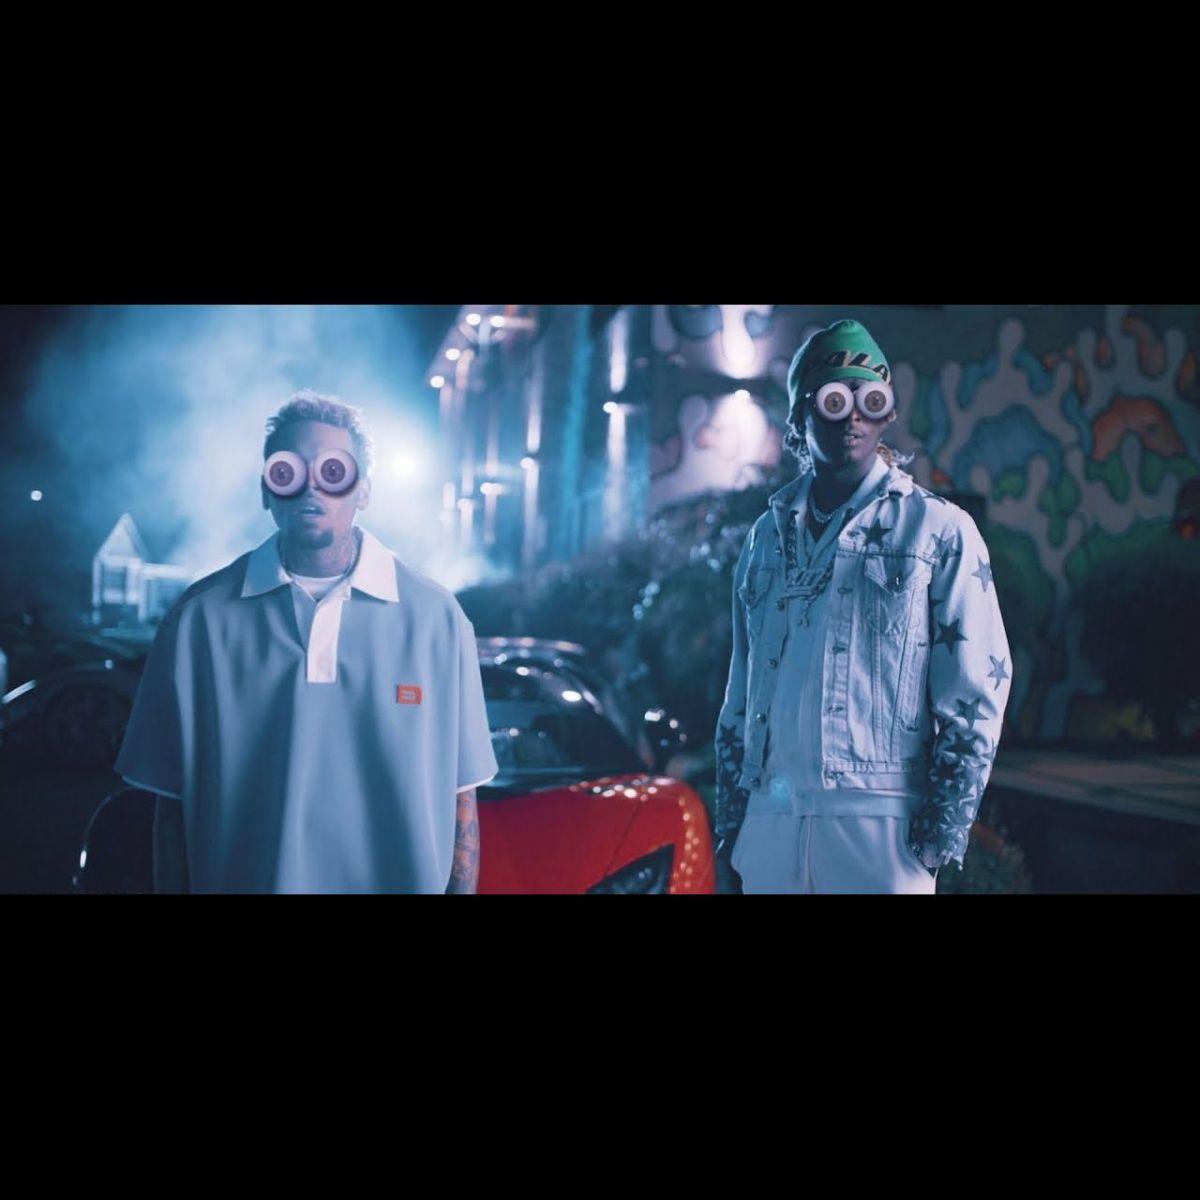 Chris Brown and Young Thug - Go Crazy (Thumbnail)